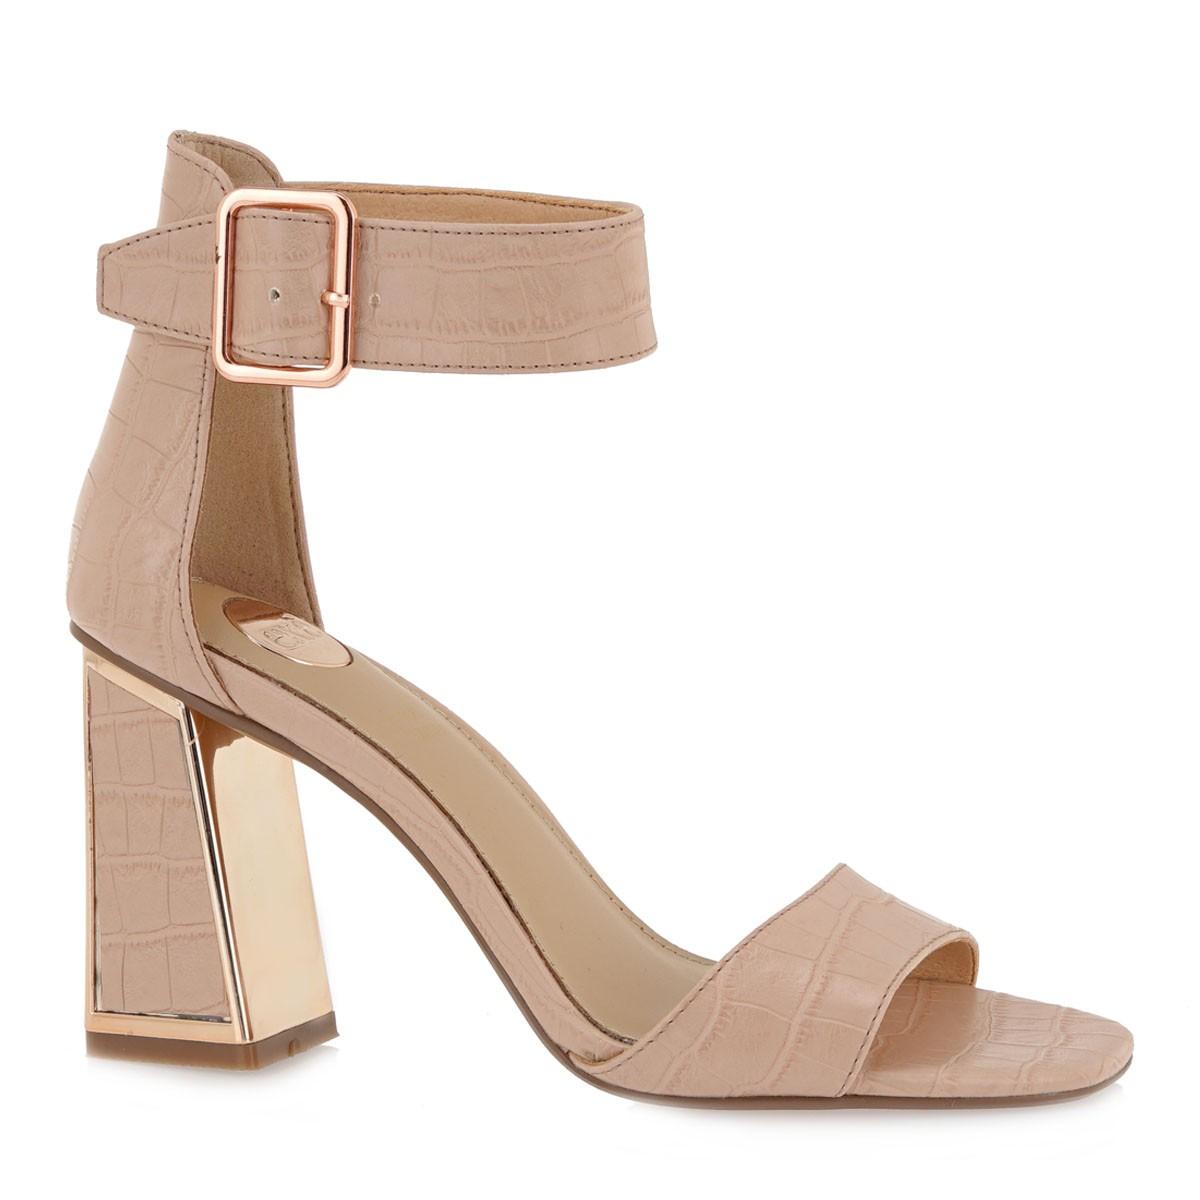 EXE Shoes Πέδιλα Γυναικεία 157-LUCIA-150 Nude Κροκό K4700157574D